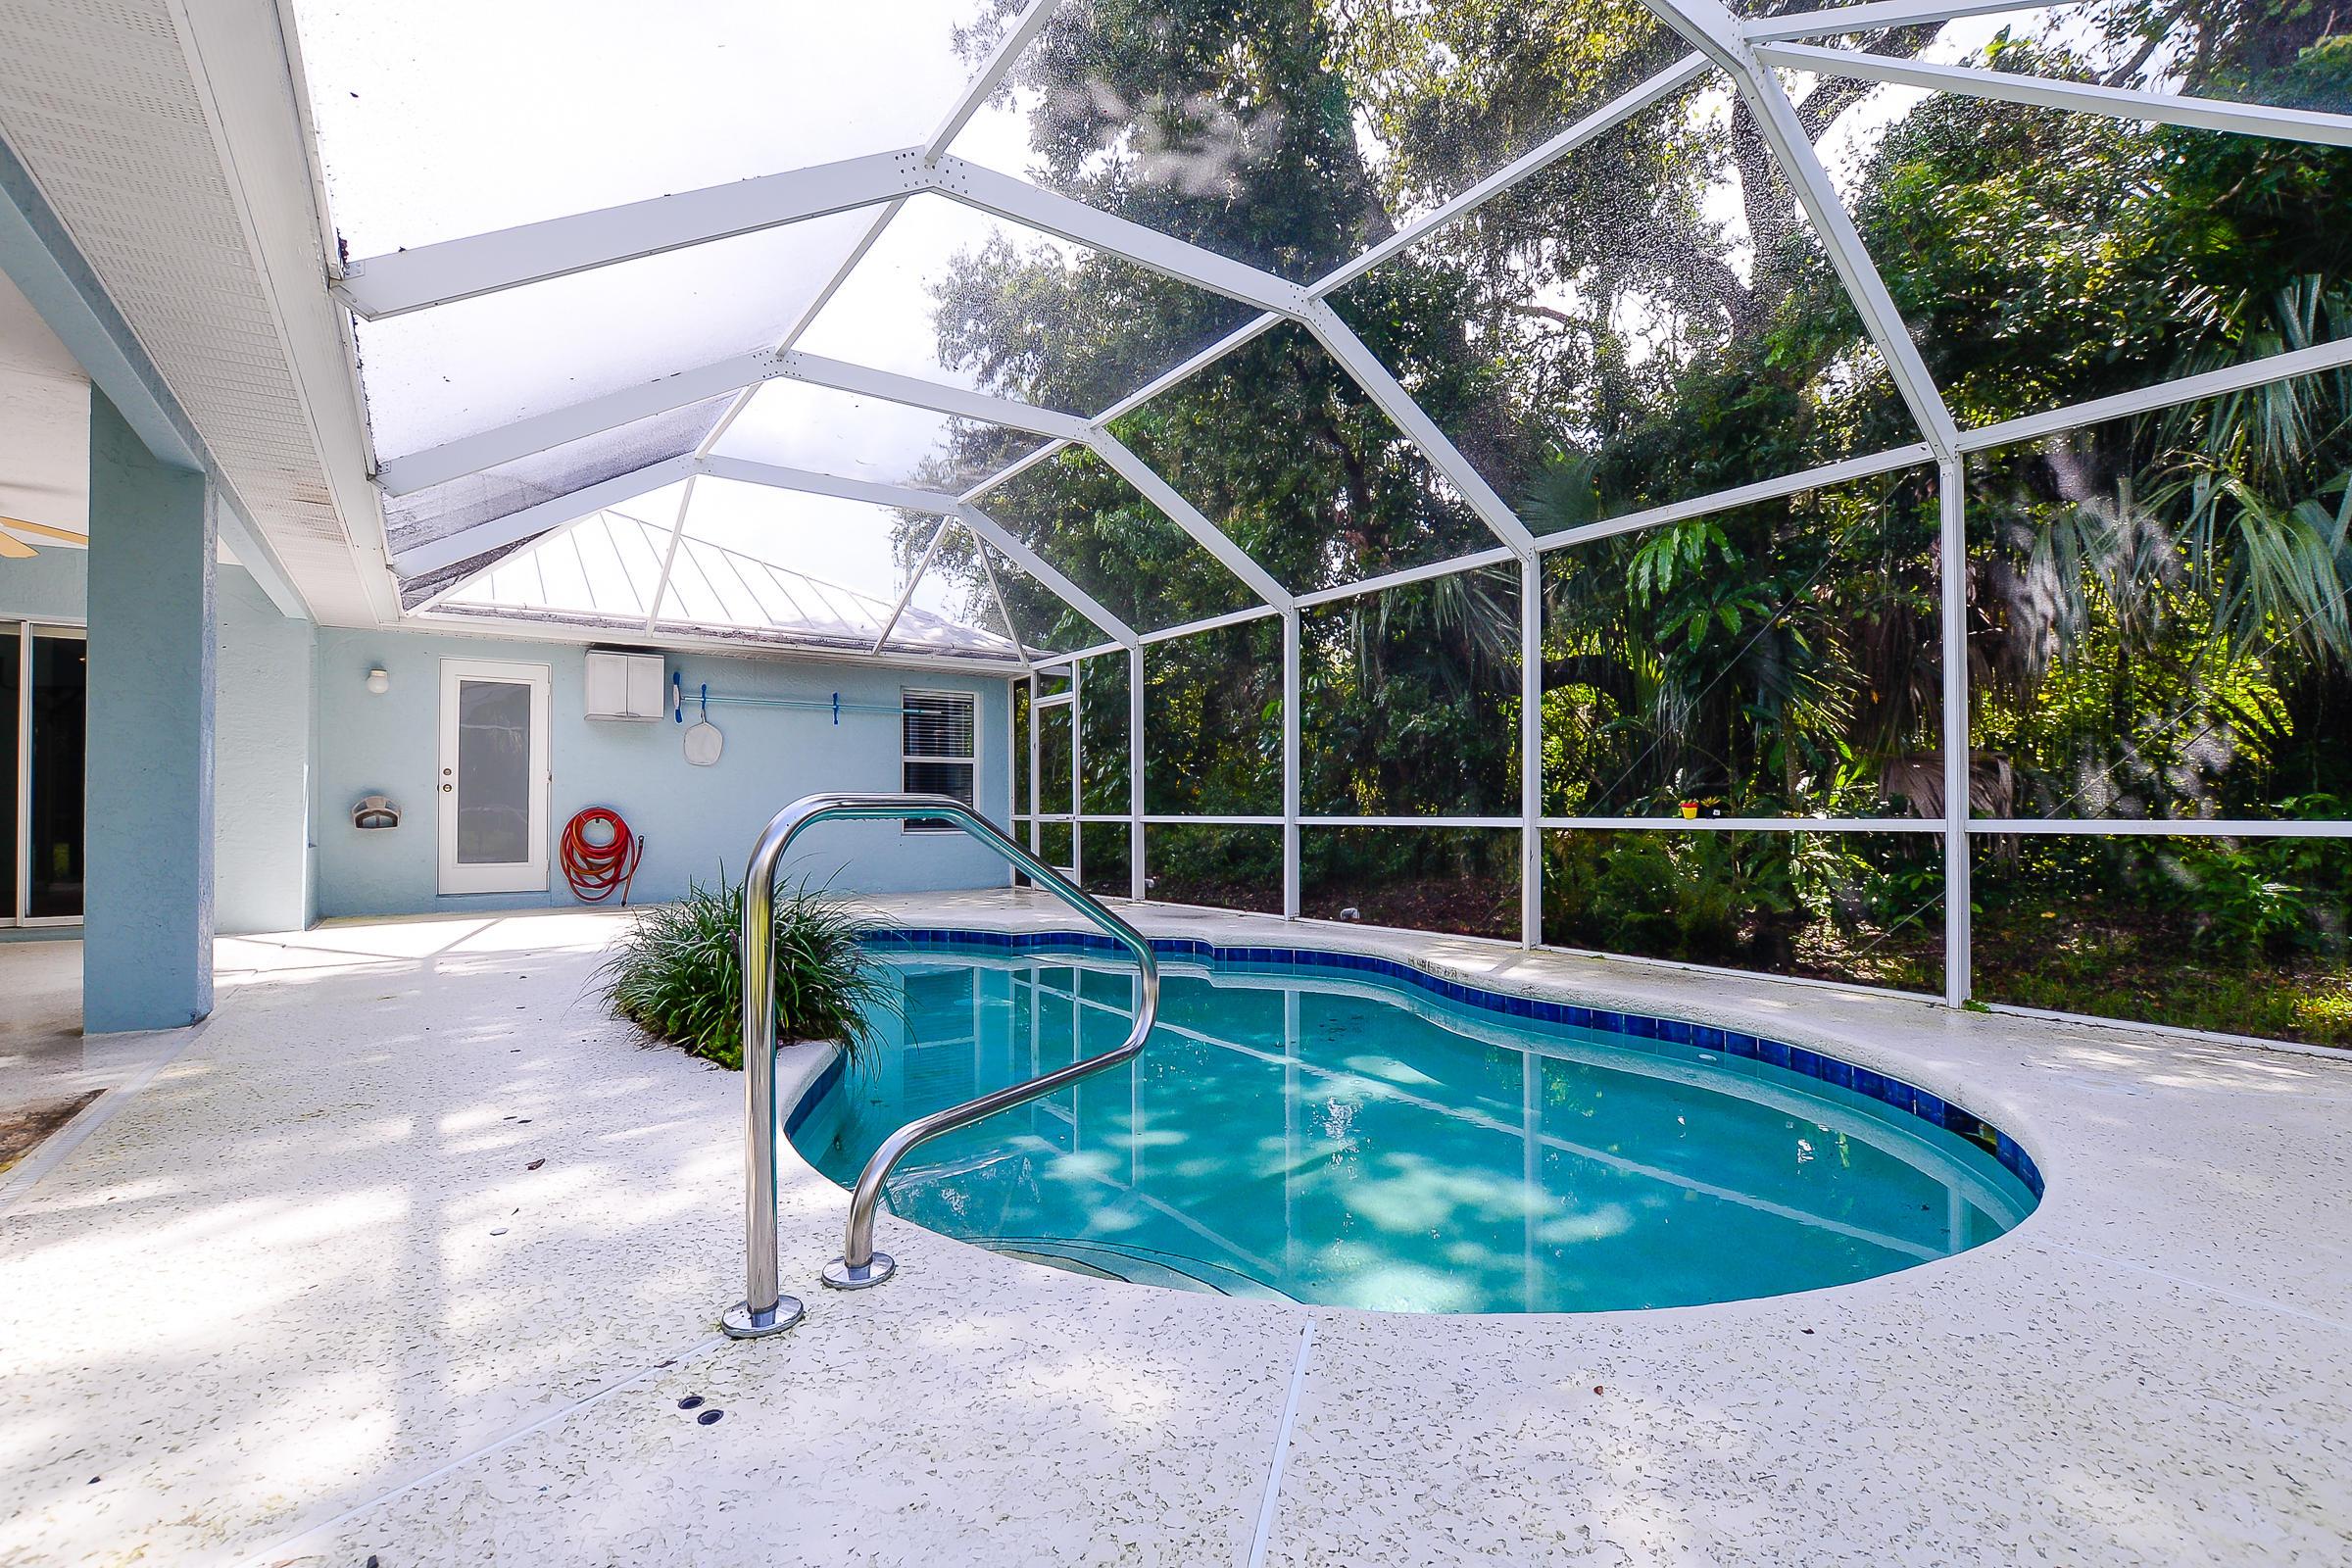 THE REEF STUART FLORIDA